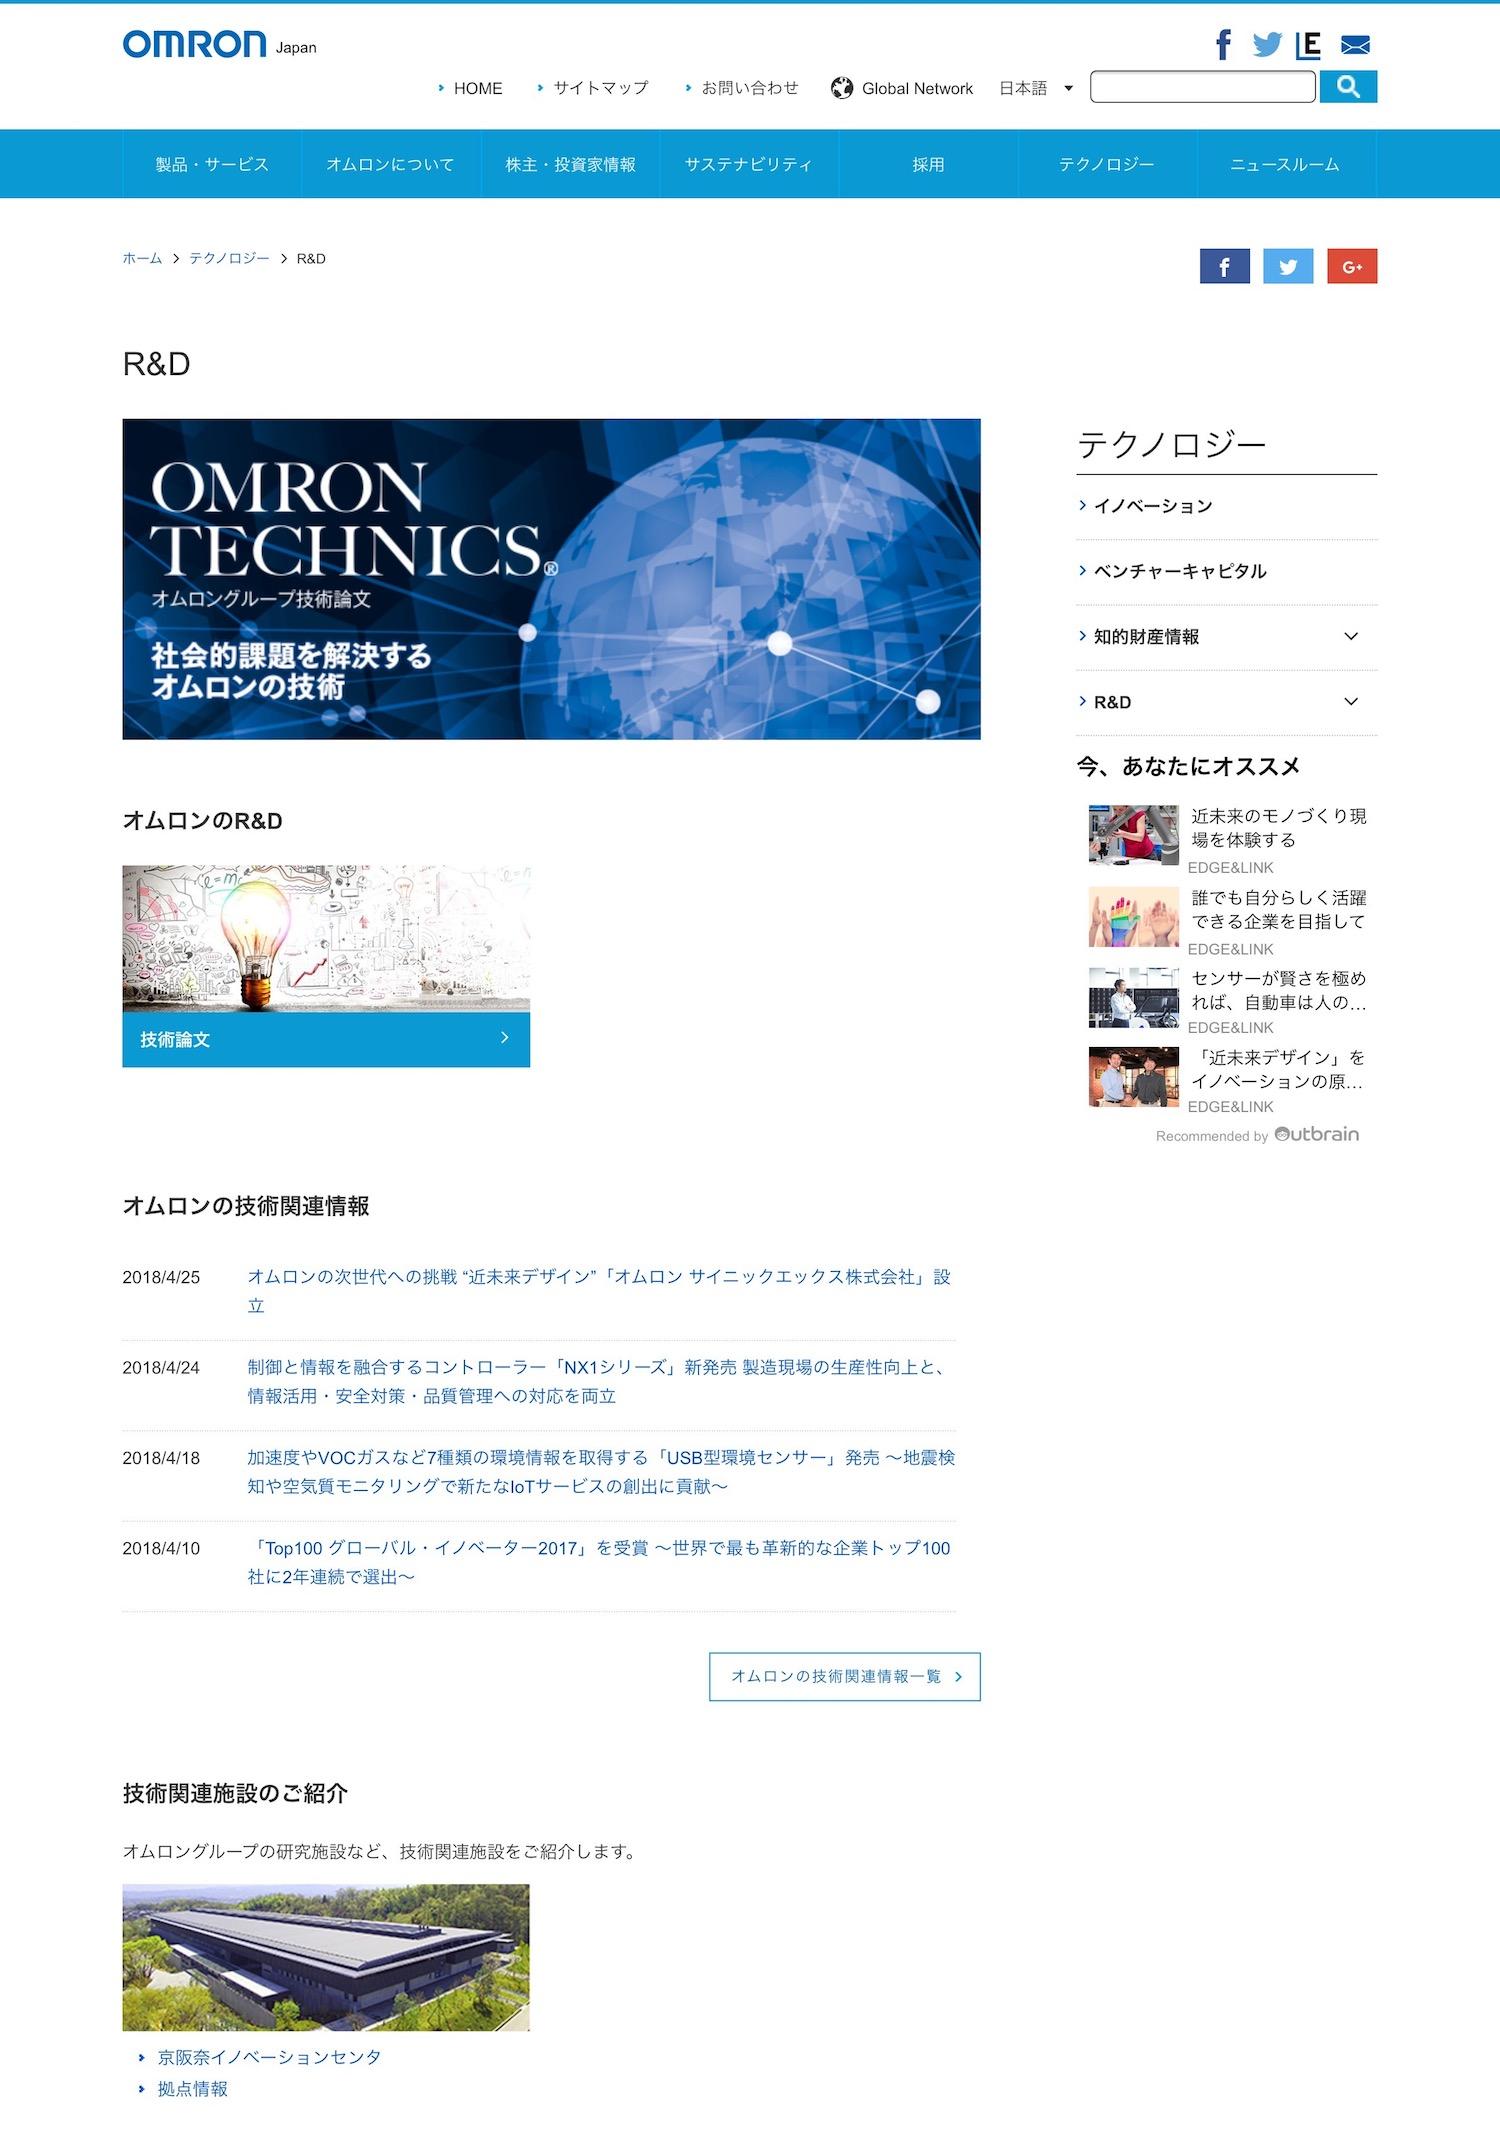 8. OMRON_Re.JPG